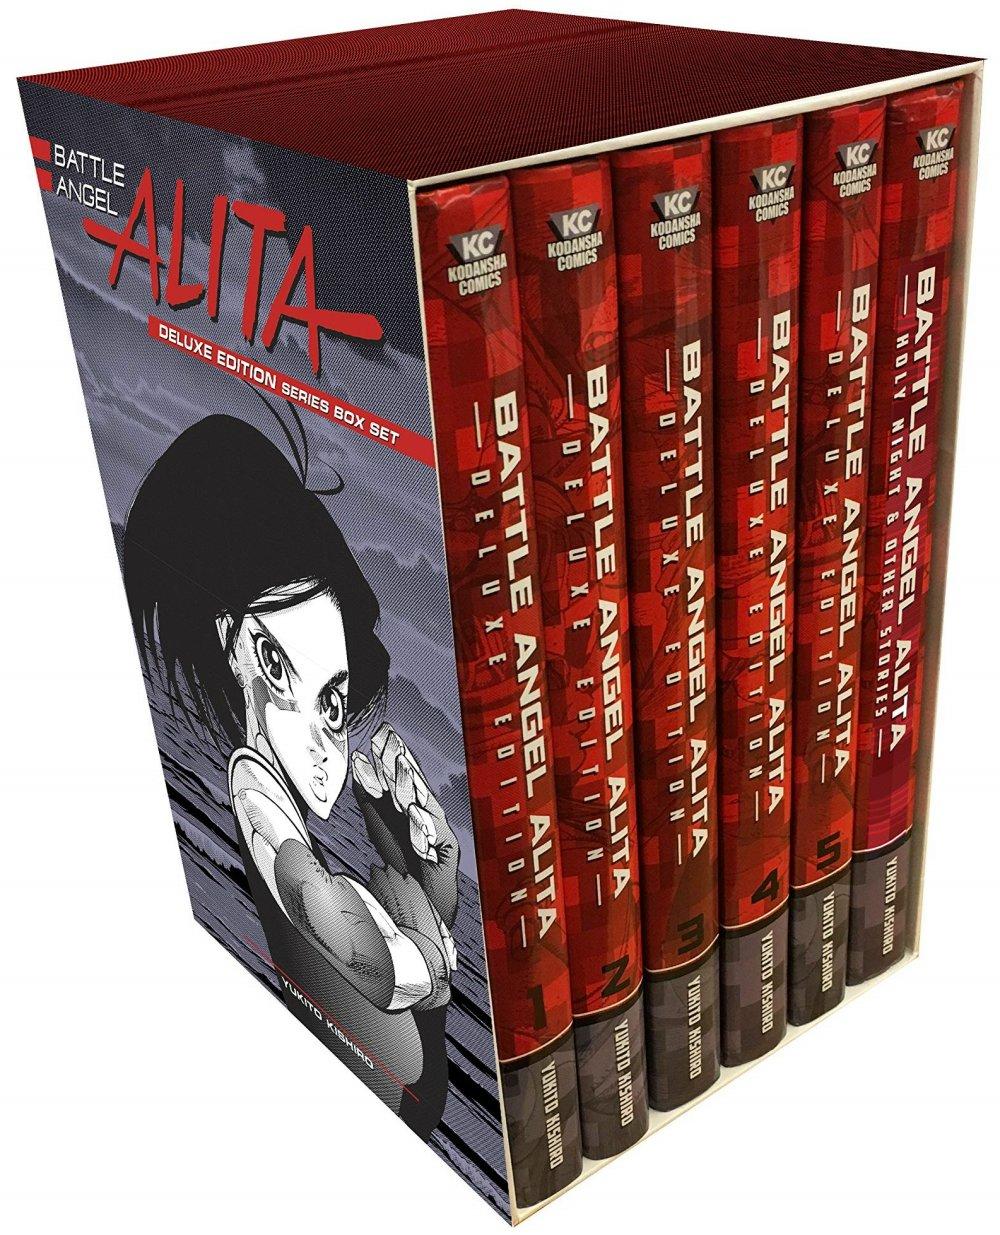 Battle Angel Alita Series Set: Includes 3 Lithograph Prints